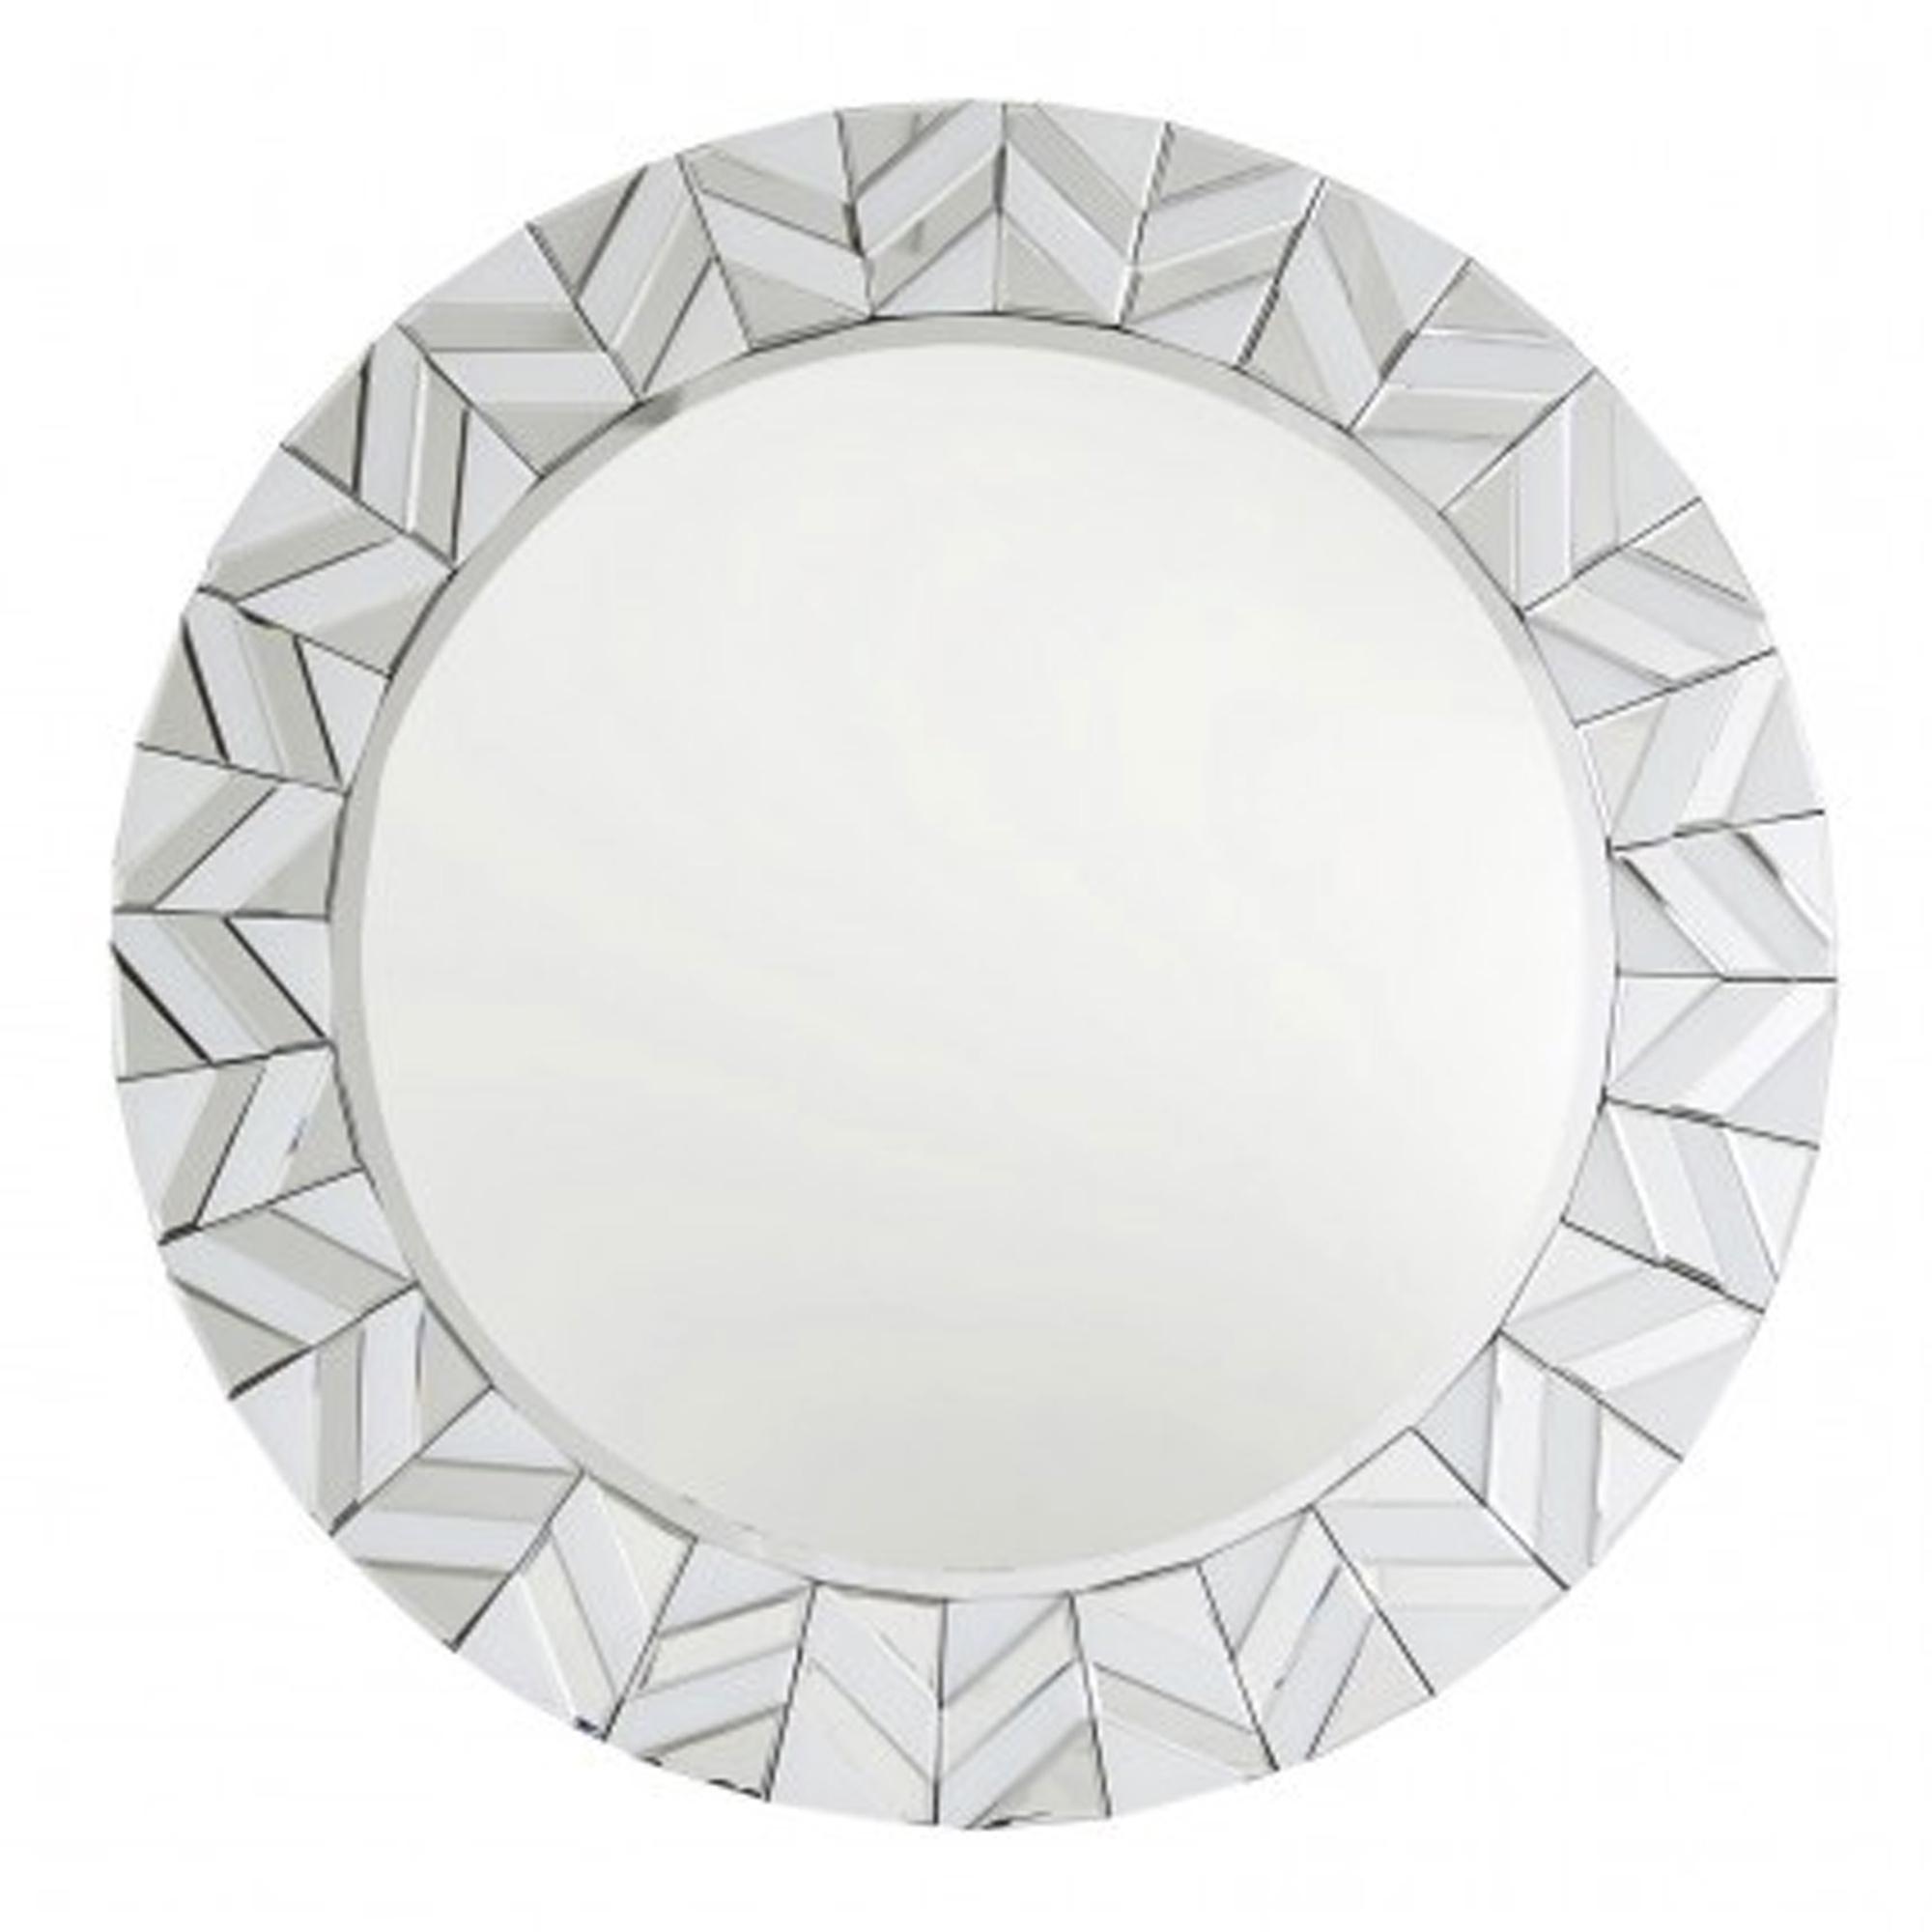 Alghero White Tiled Round Wall Mirror For Latest White Round Wall Mirrors (View 8 of 20)